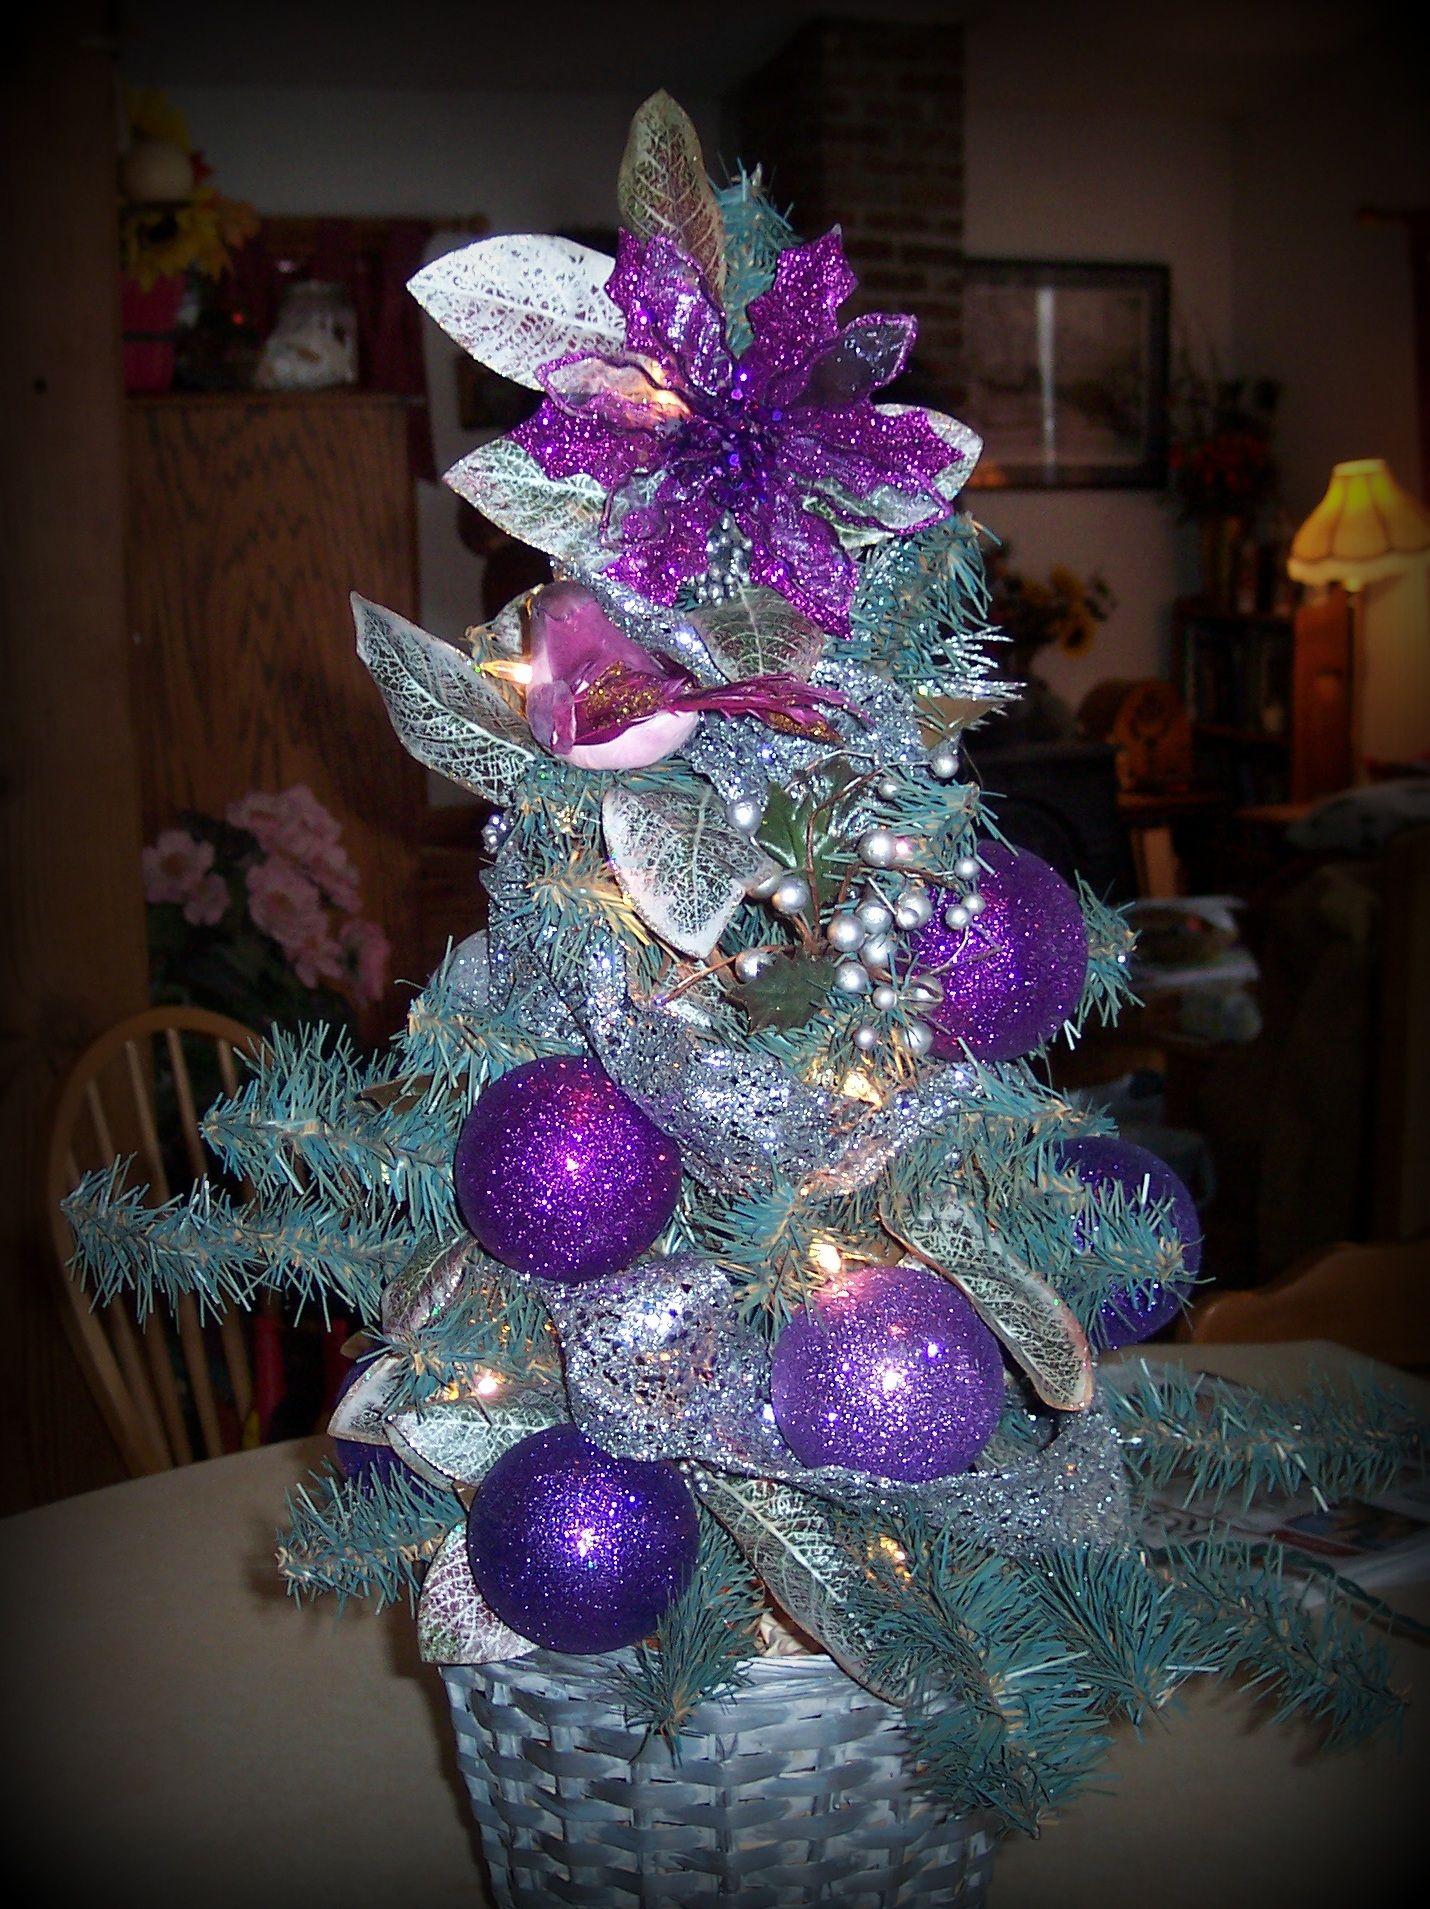 Christmas tree in purple